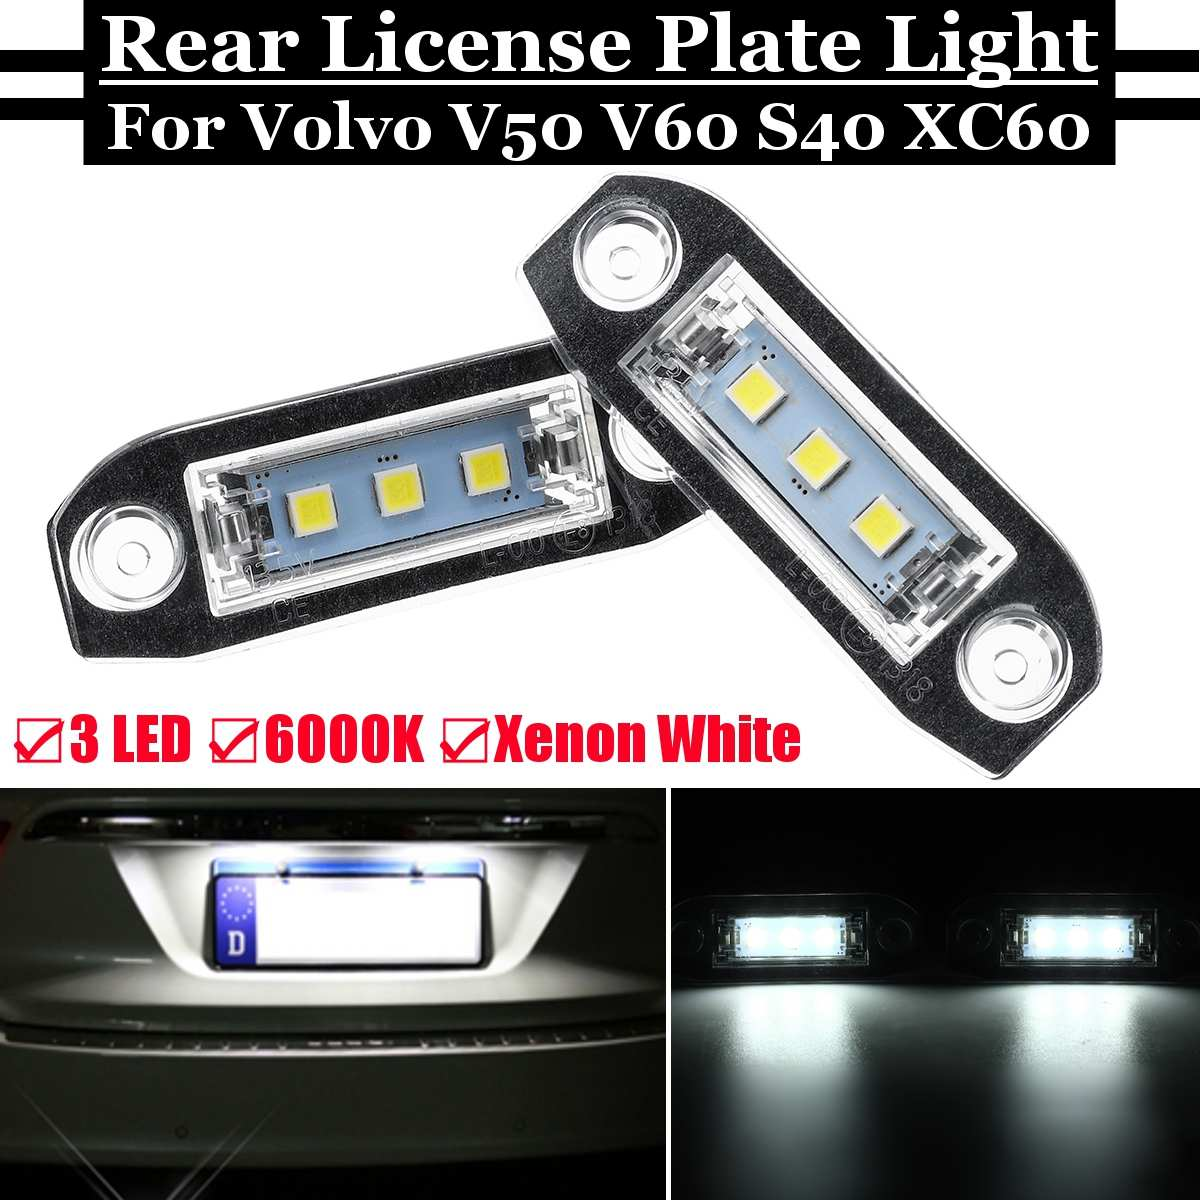 Nuevo coche 2 uds LED de luz de matrícula trasera brillante blanco Número de lámpara para Volvo S40 S60 S80 V50 V60 V70 Xc60 Xc70 Xc90 2004-2015